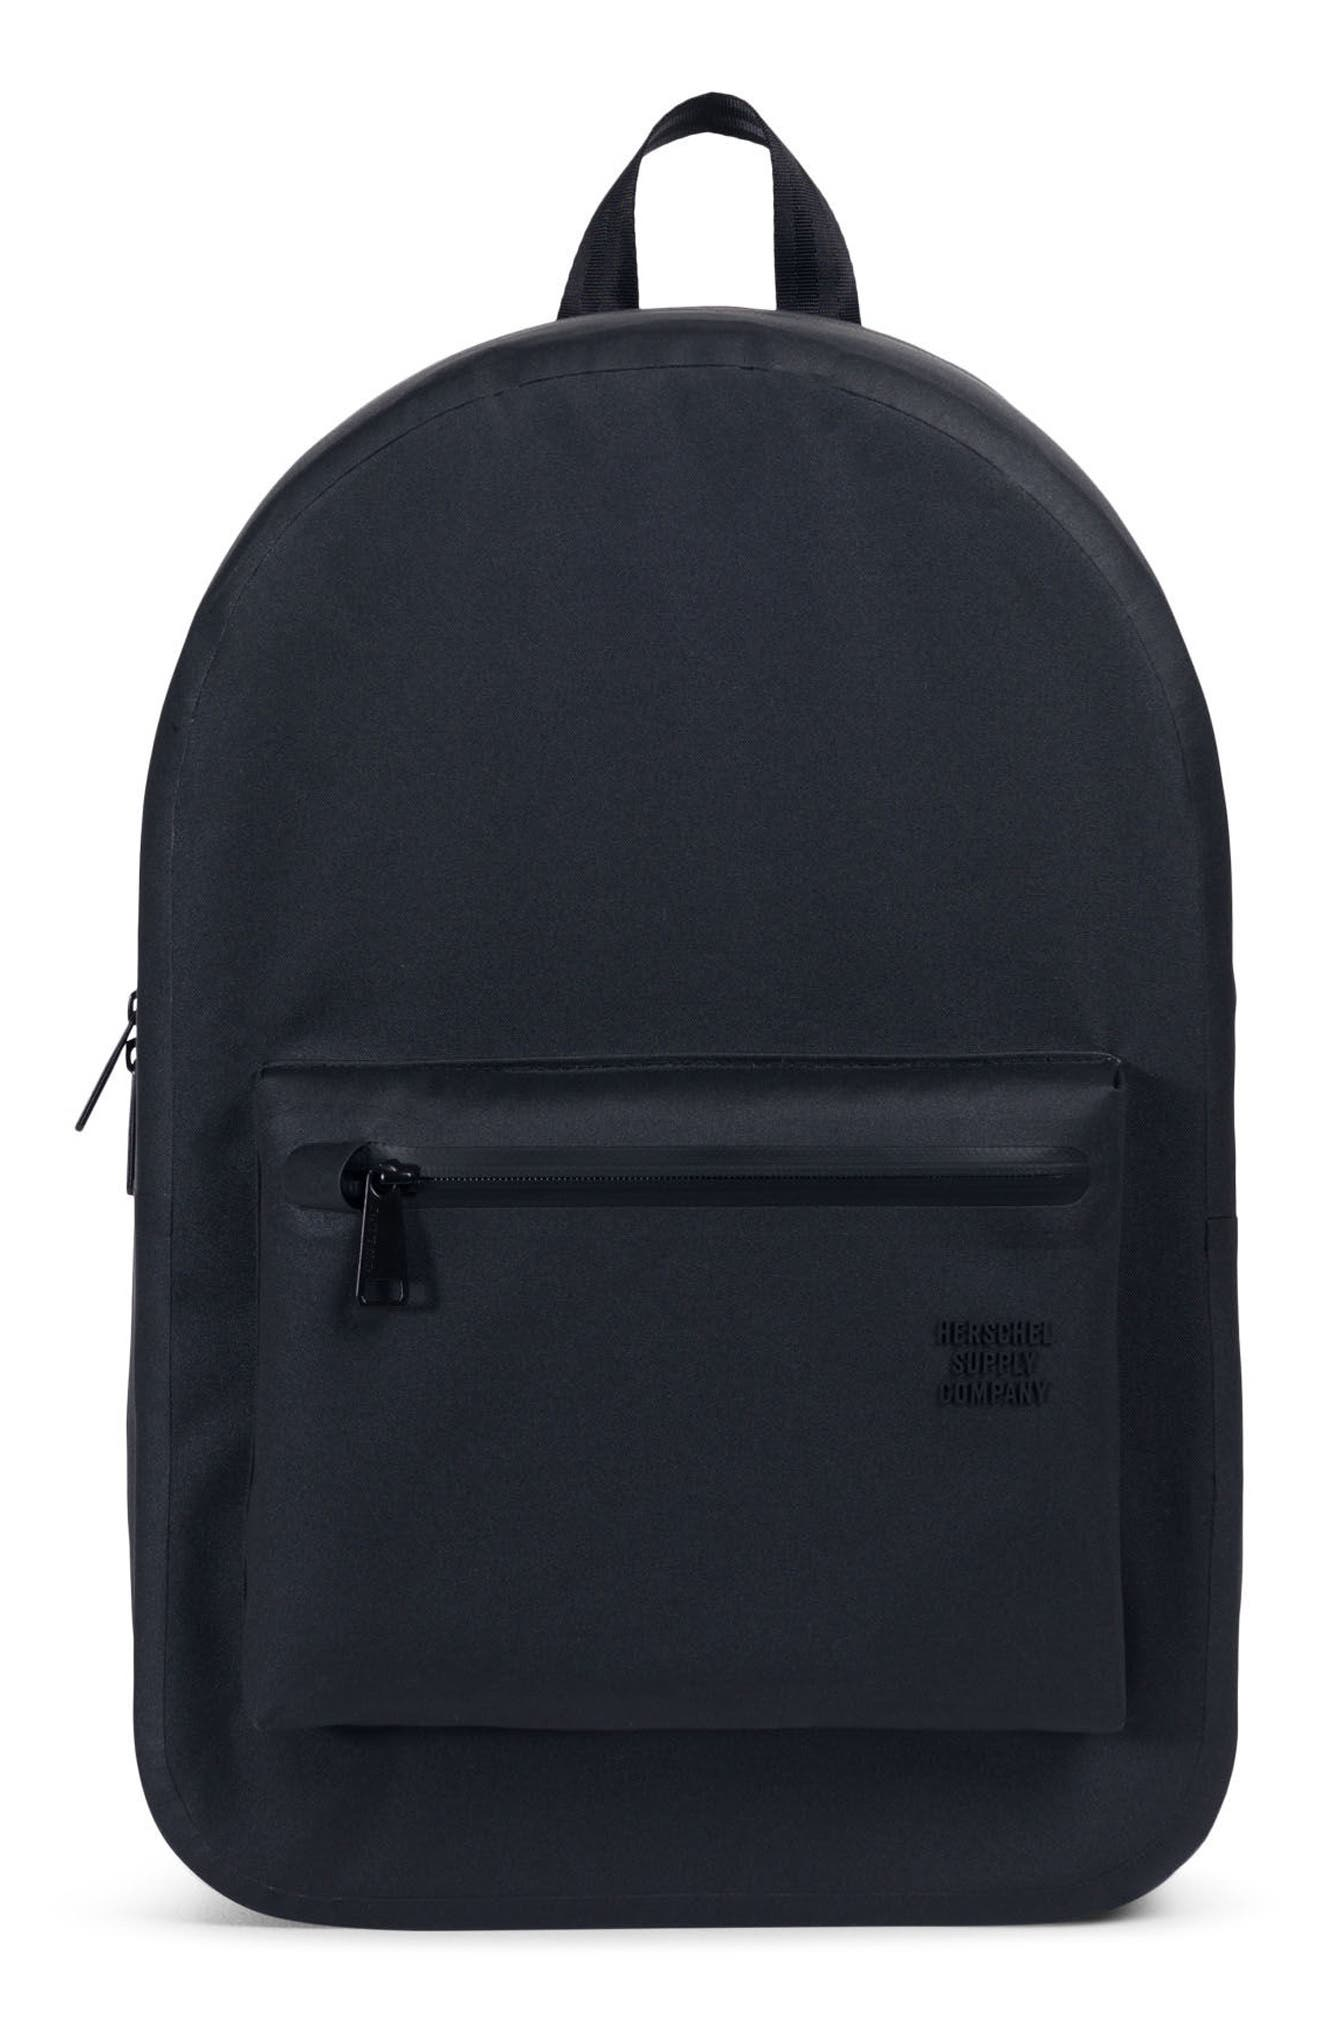 Settlement Studio Backpack,                         Main,                         color, 001